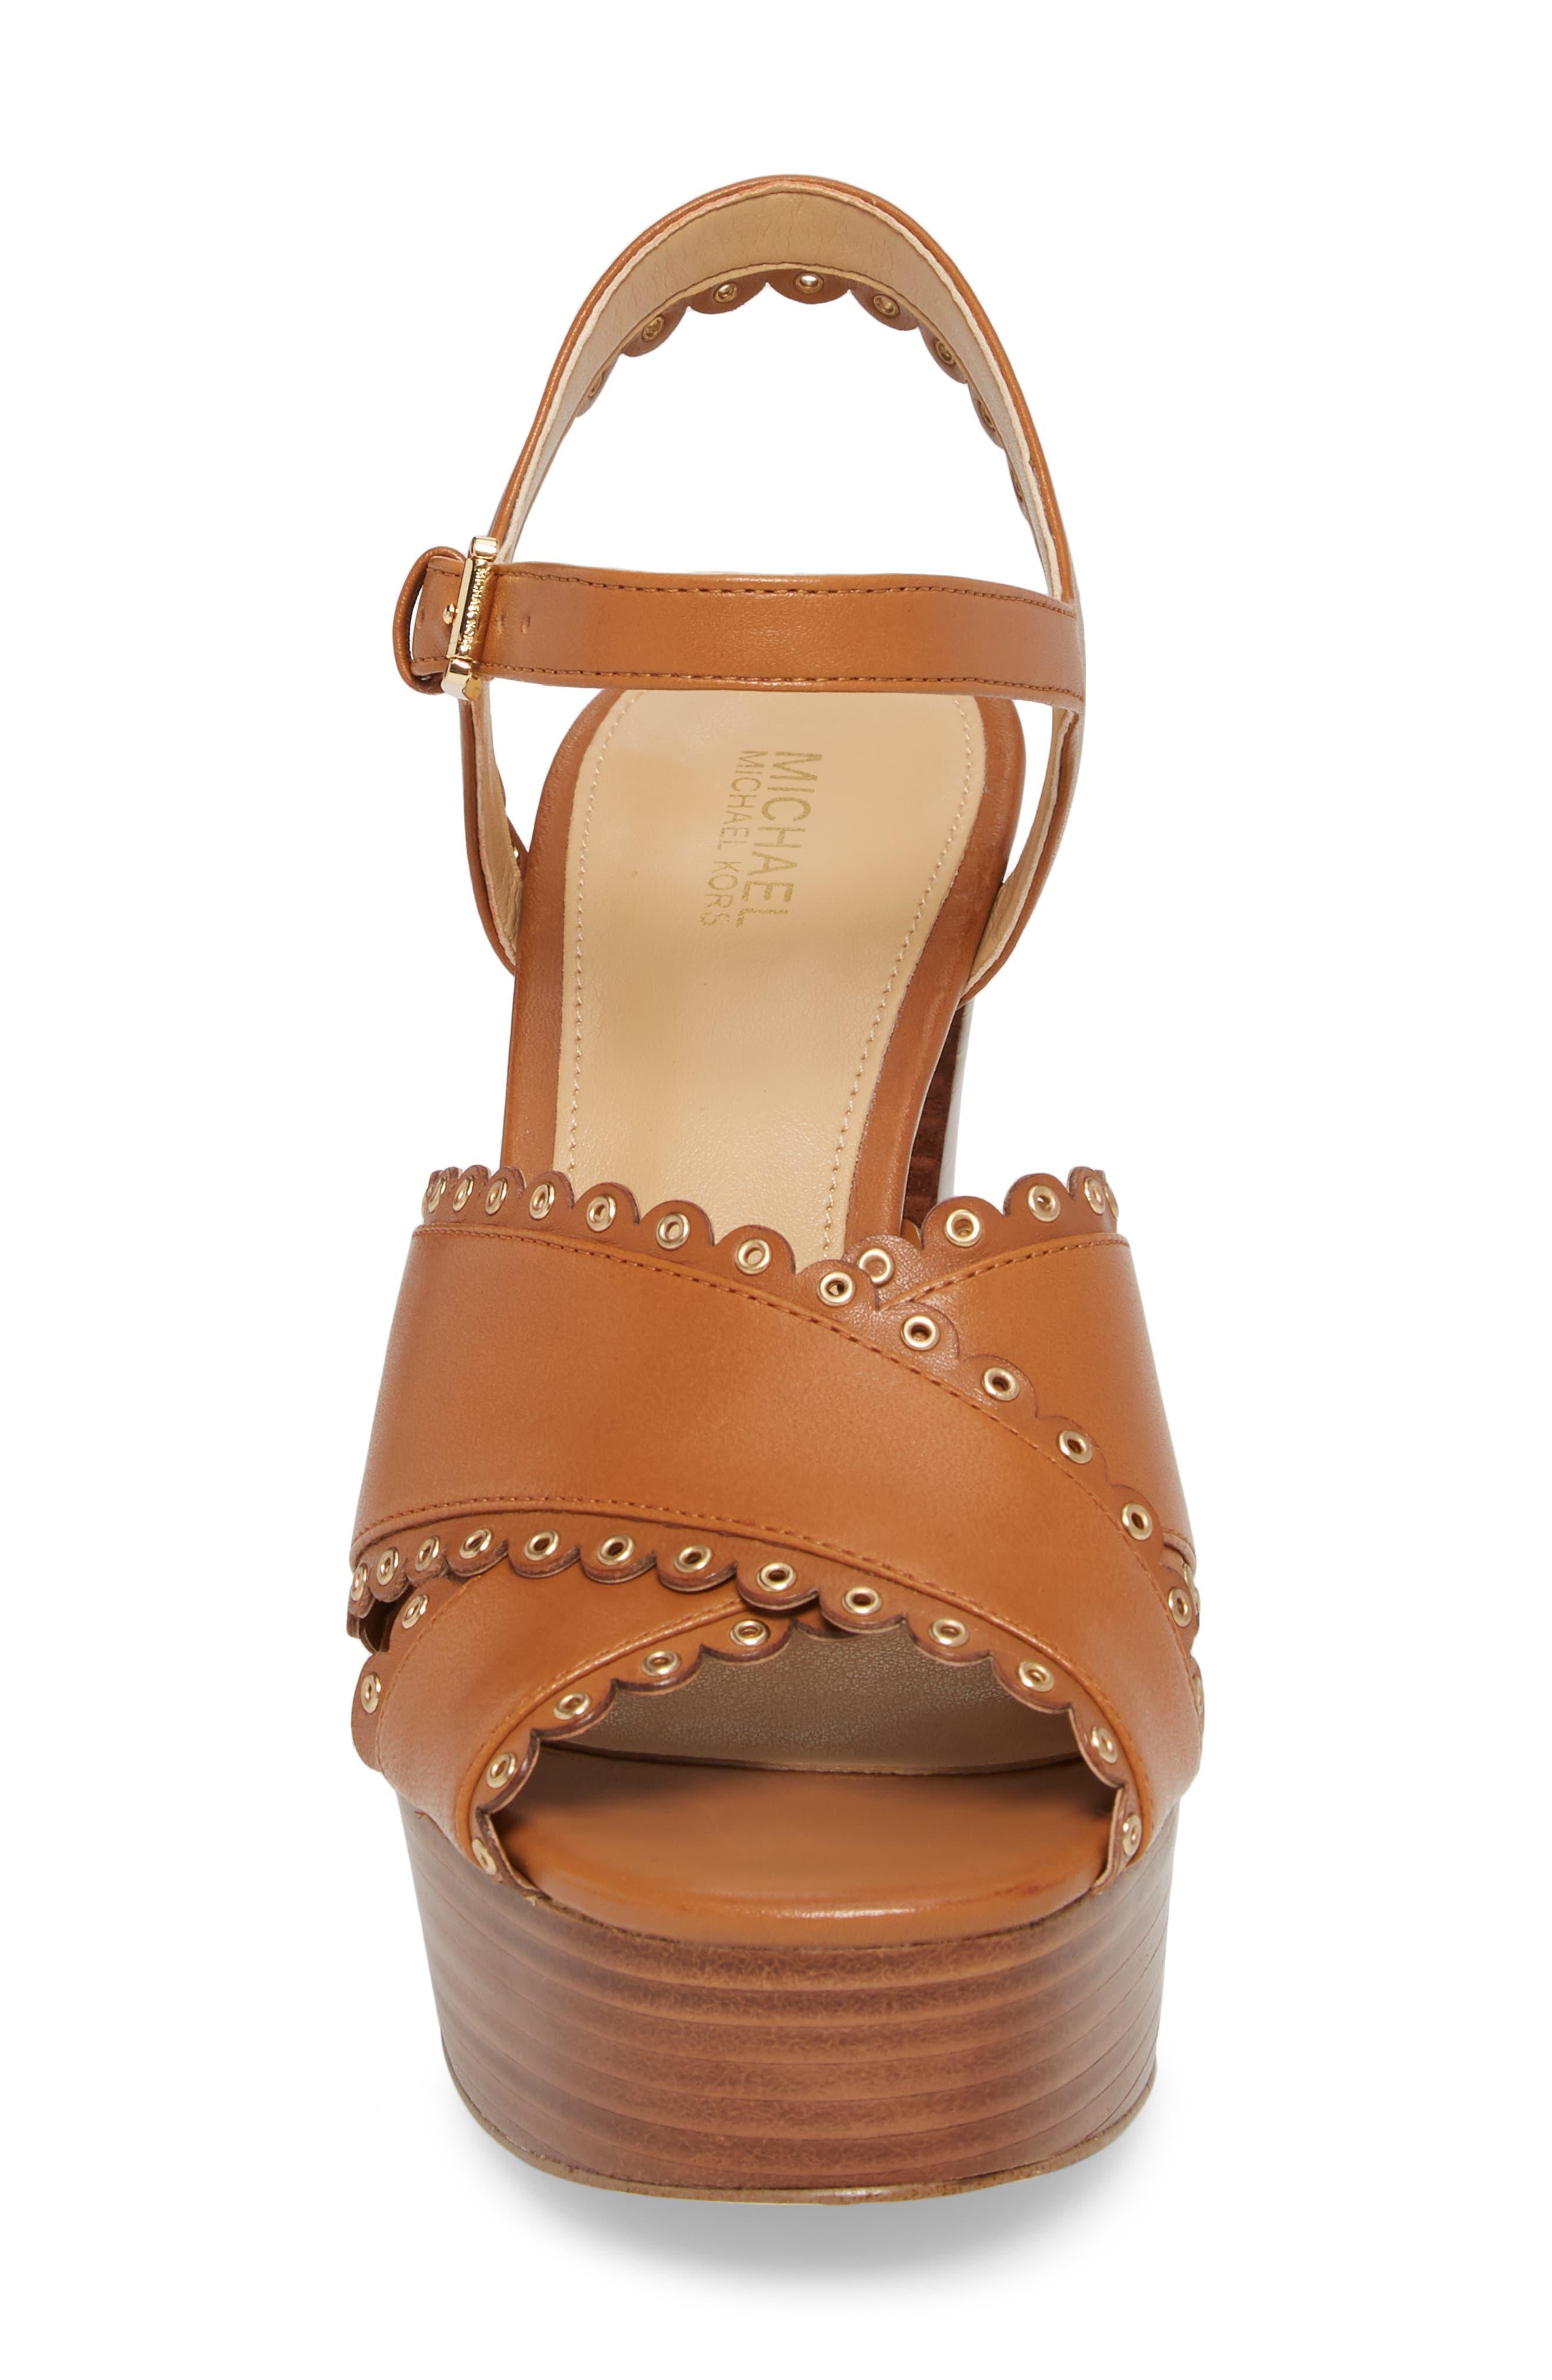 Jessie Platform Sandal,                             Alternate thumbnail 3, color,                             Acorn Leather